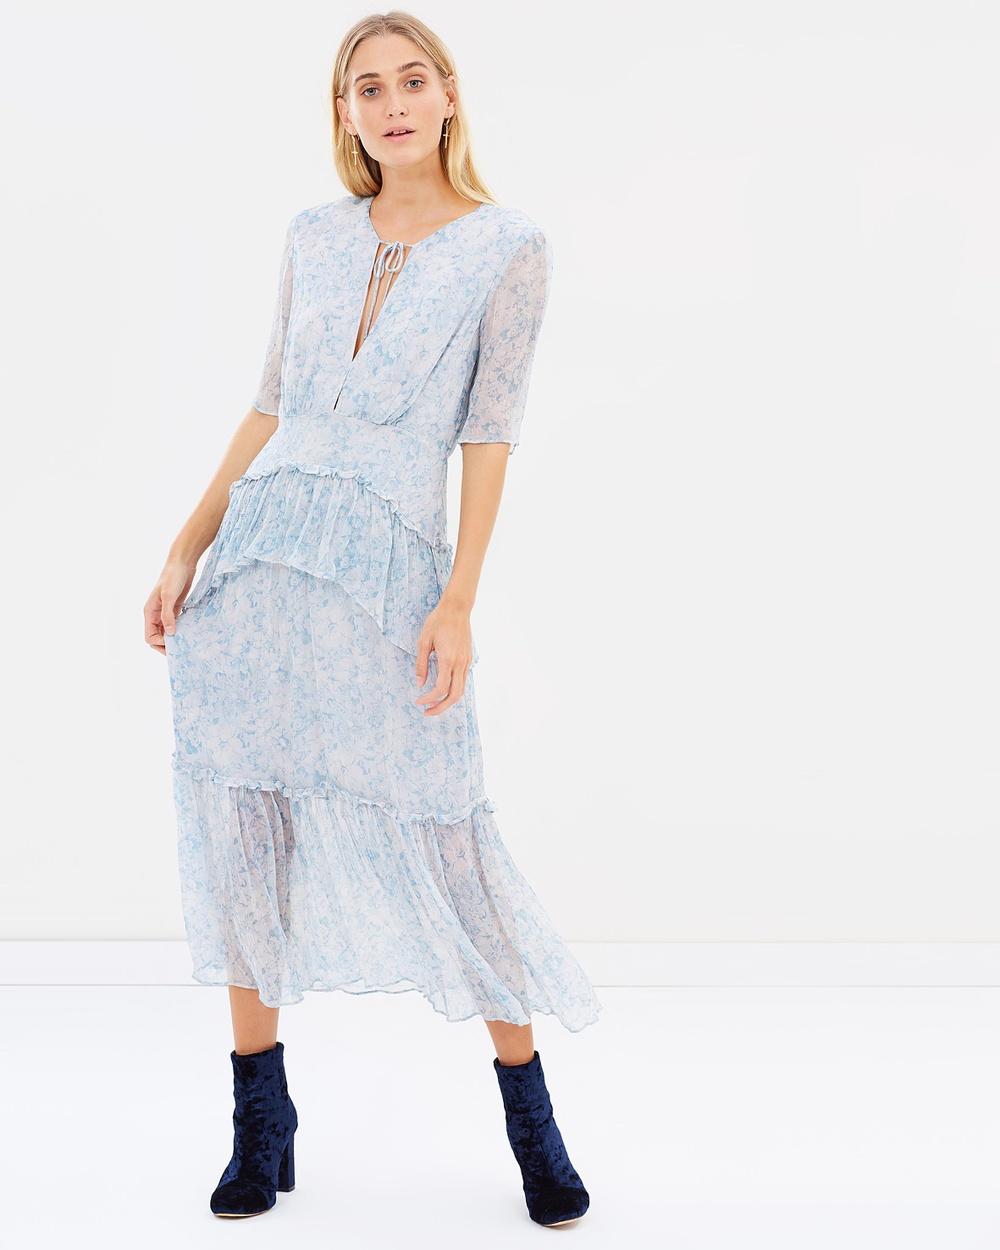 Stevie May La Fleur Camille Blue Print Iris Midi Dress